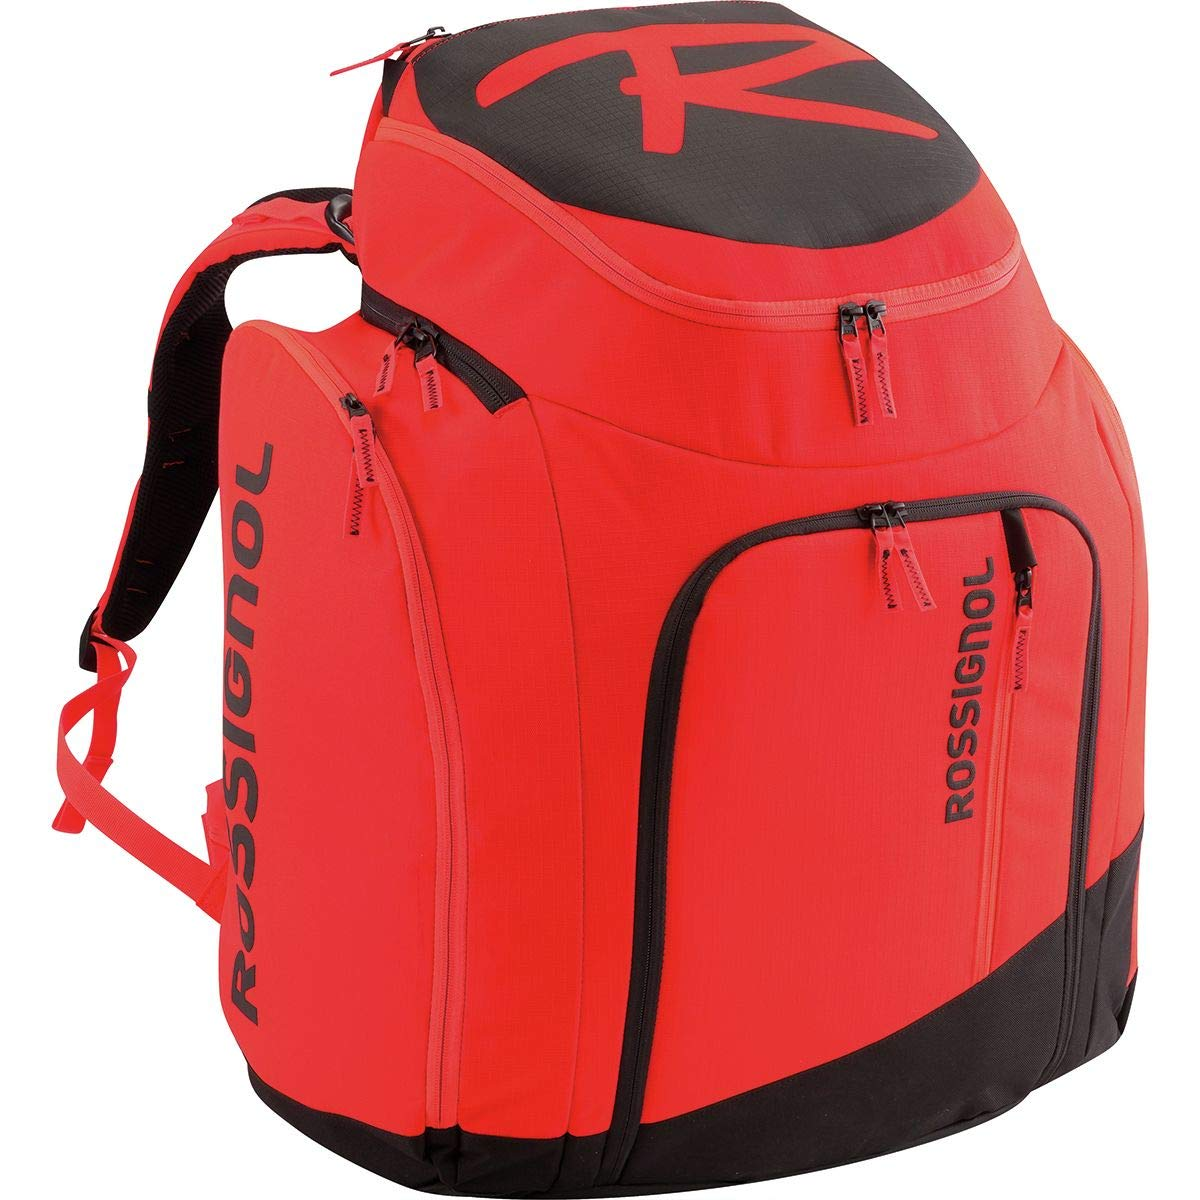 Rossignol Hero Hero Hero Athletes Bag Rucksack (rot schwarz) B07DPNPF17 Skiruckscke Optimaler Preis 4461aa